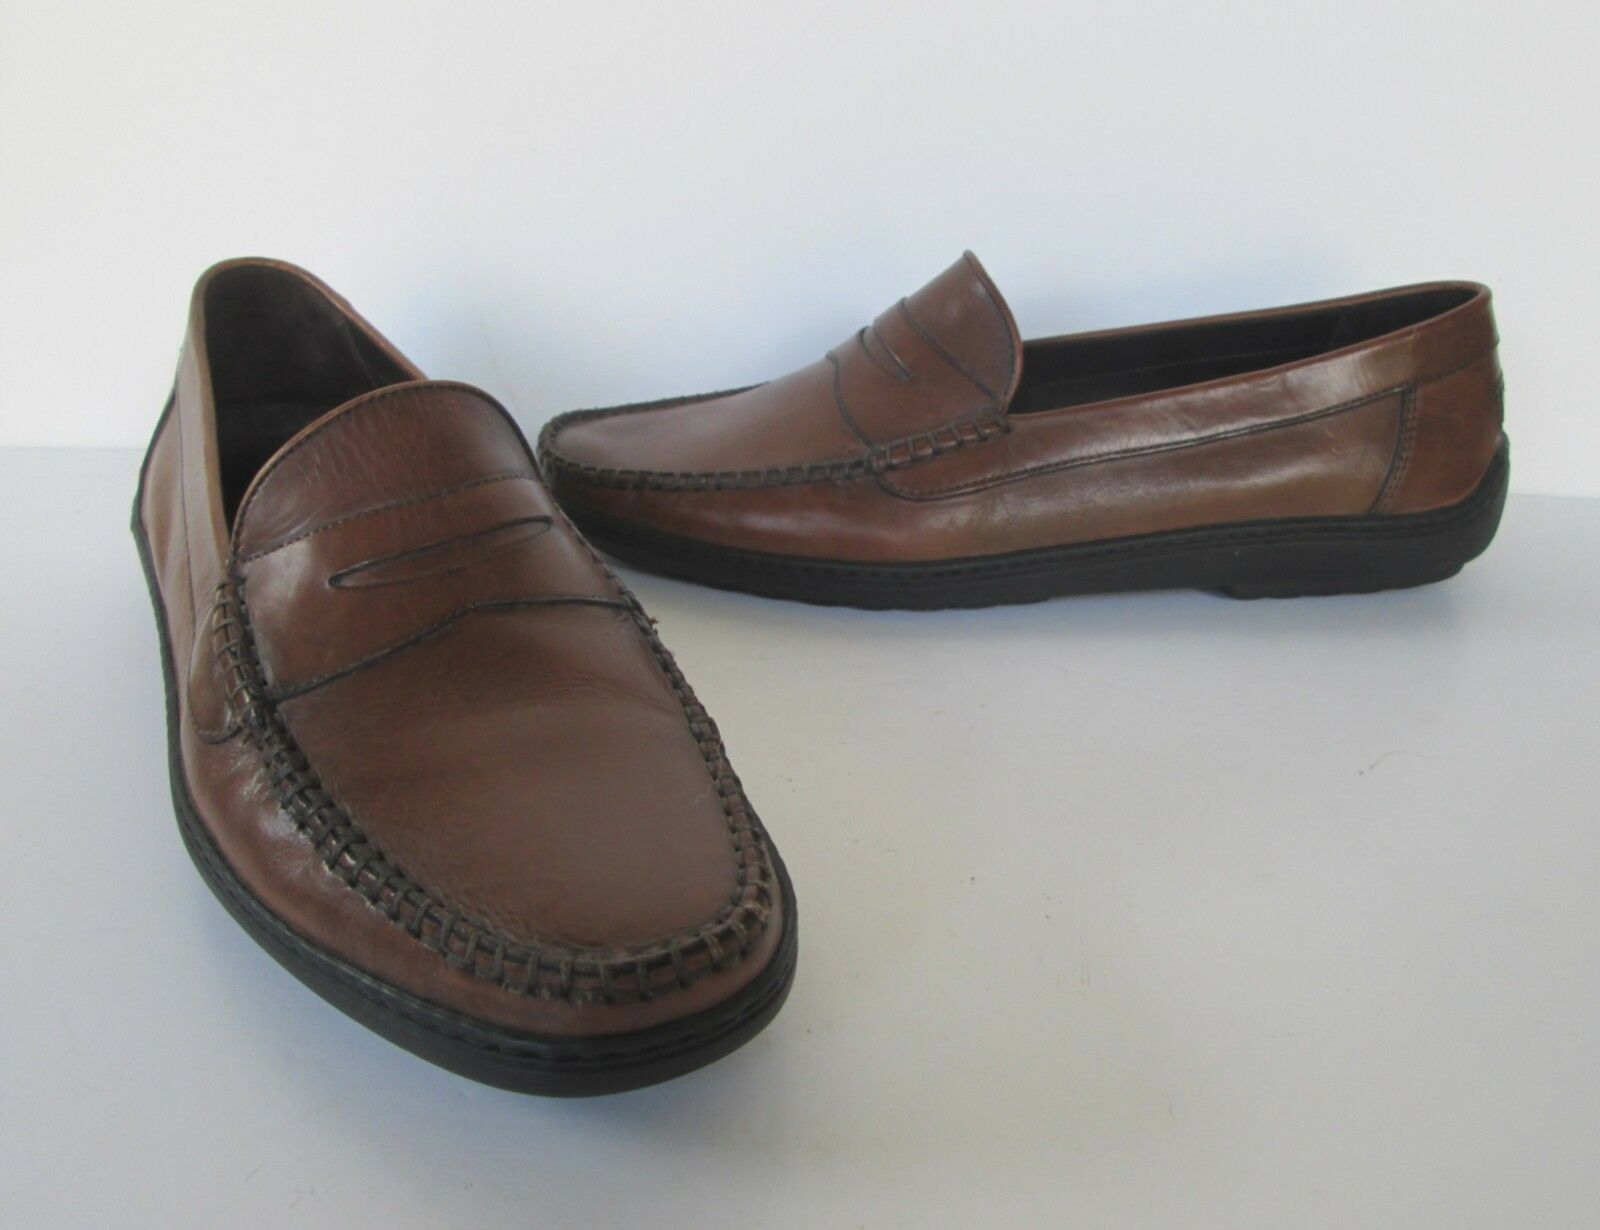 Bragano  Uomo Lovely Braun Leder Dress Moc Penny Loafers Casual Dress Leder Schuhes 9 M 57e703